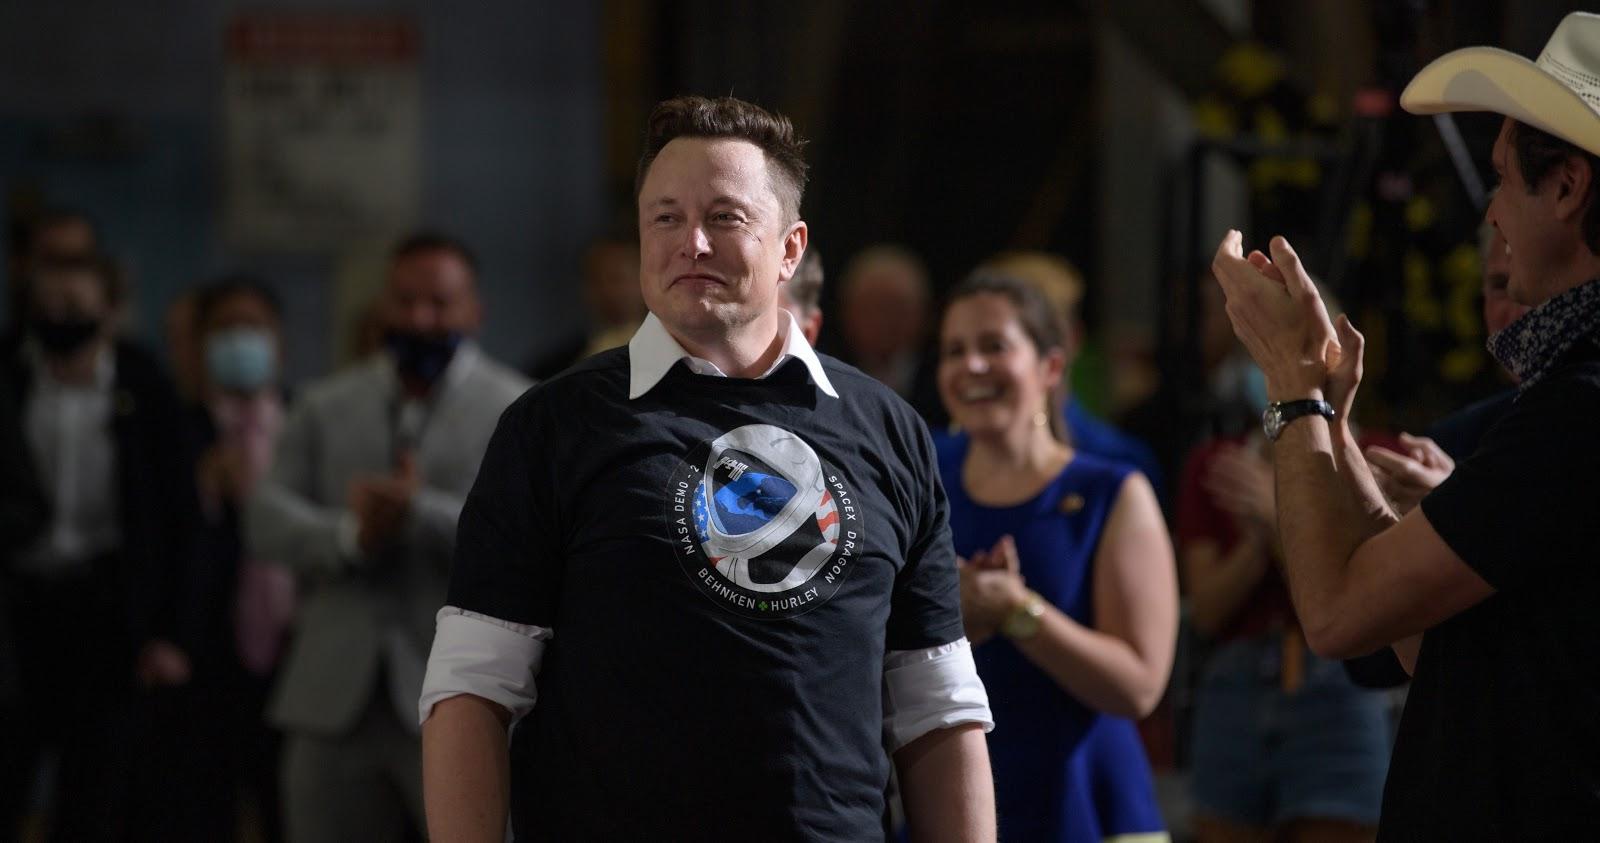 Friends Of Nasa Elon Musk Chief Engineer Of Spacex Nasa